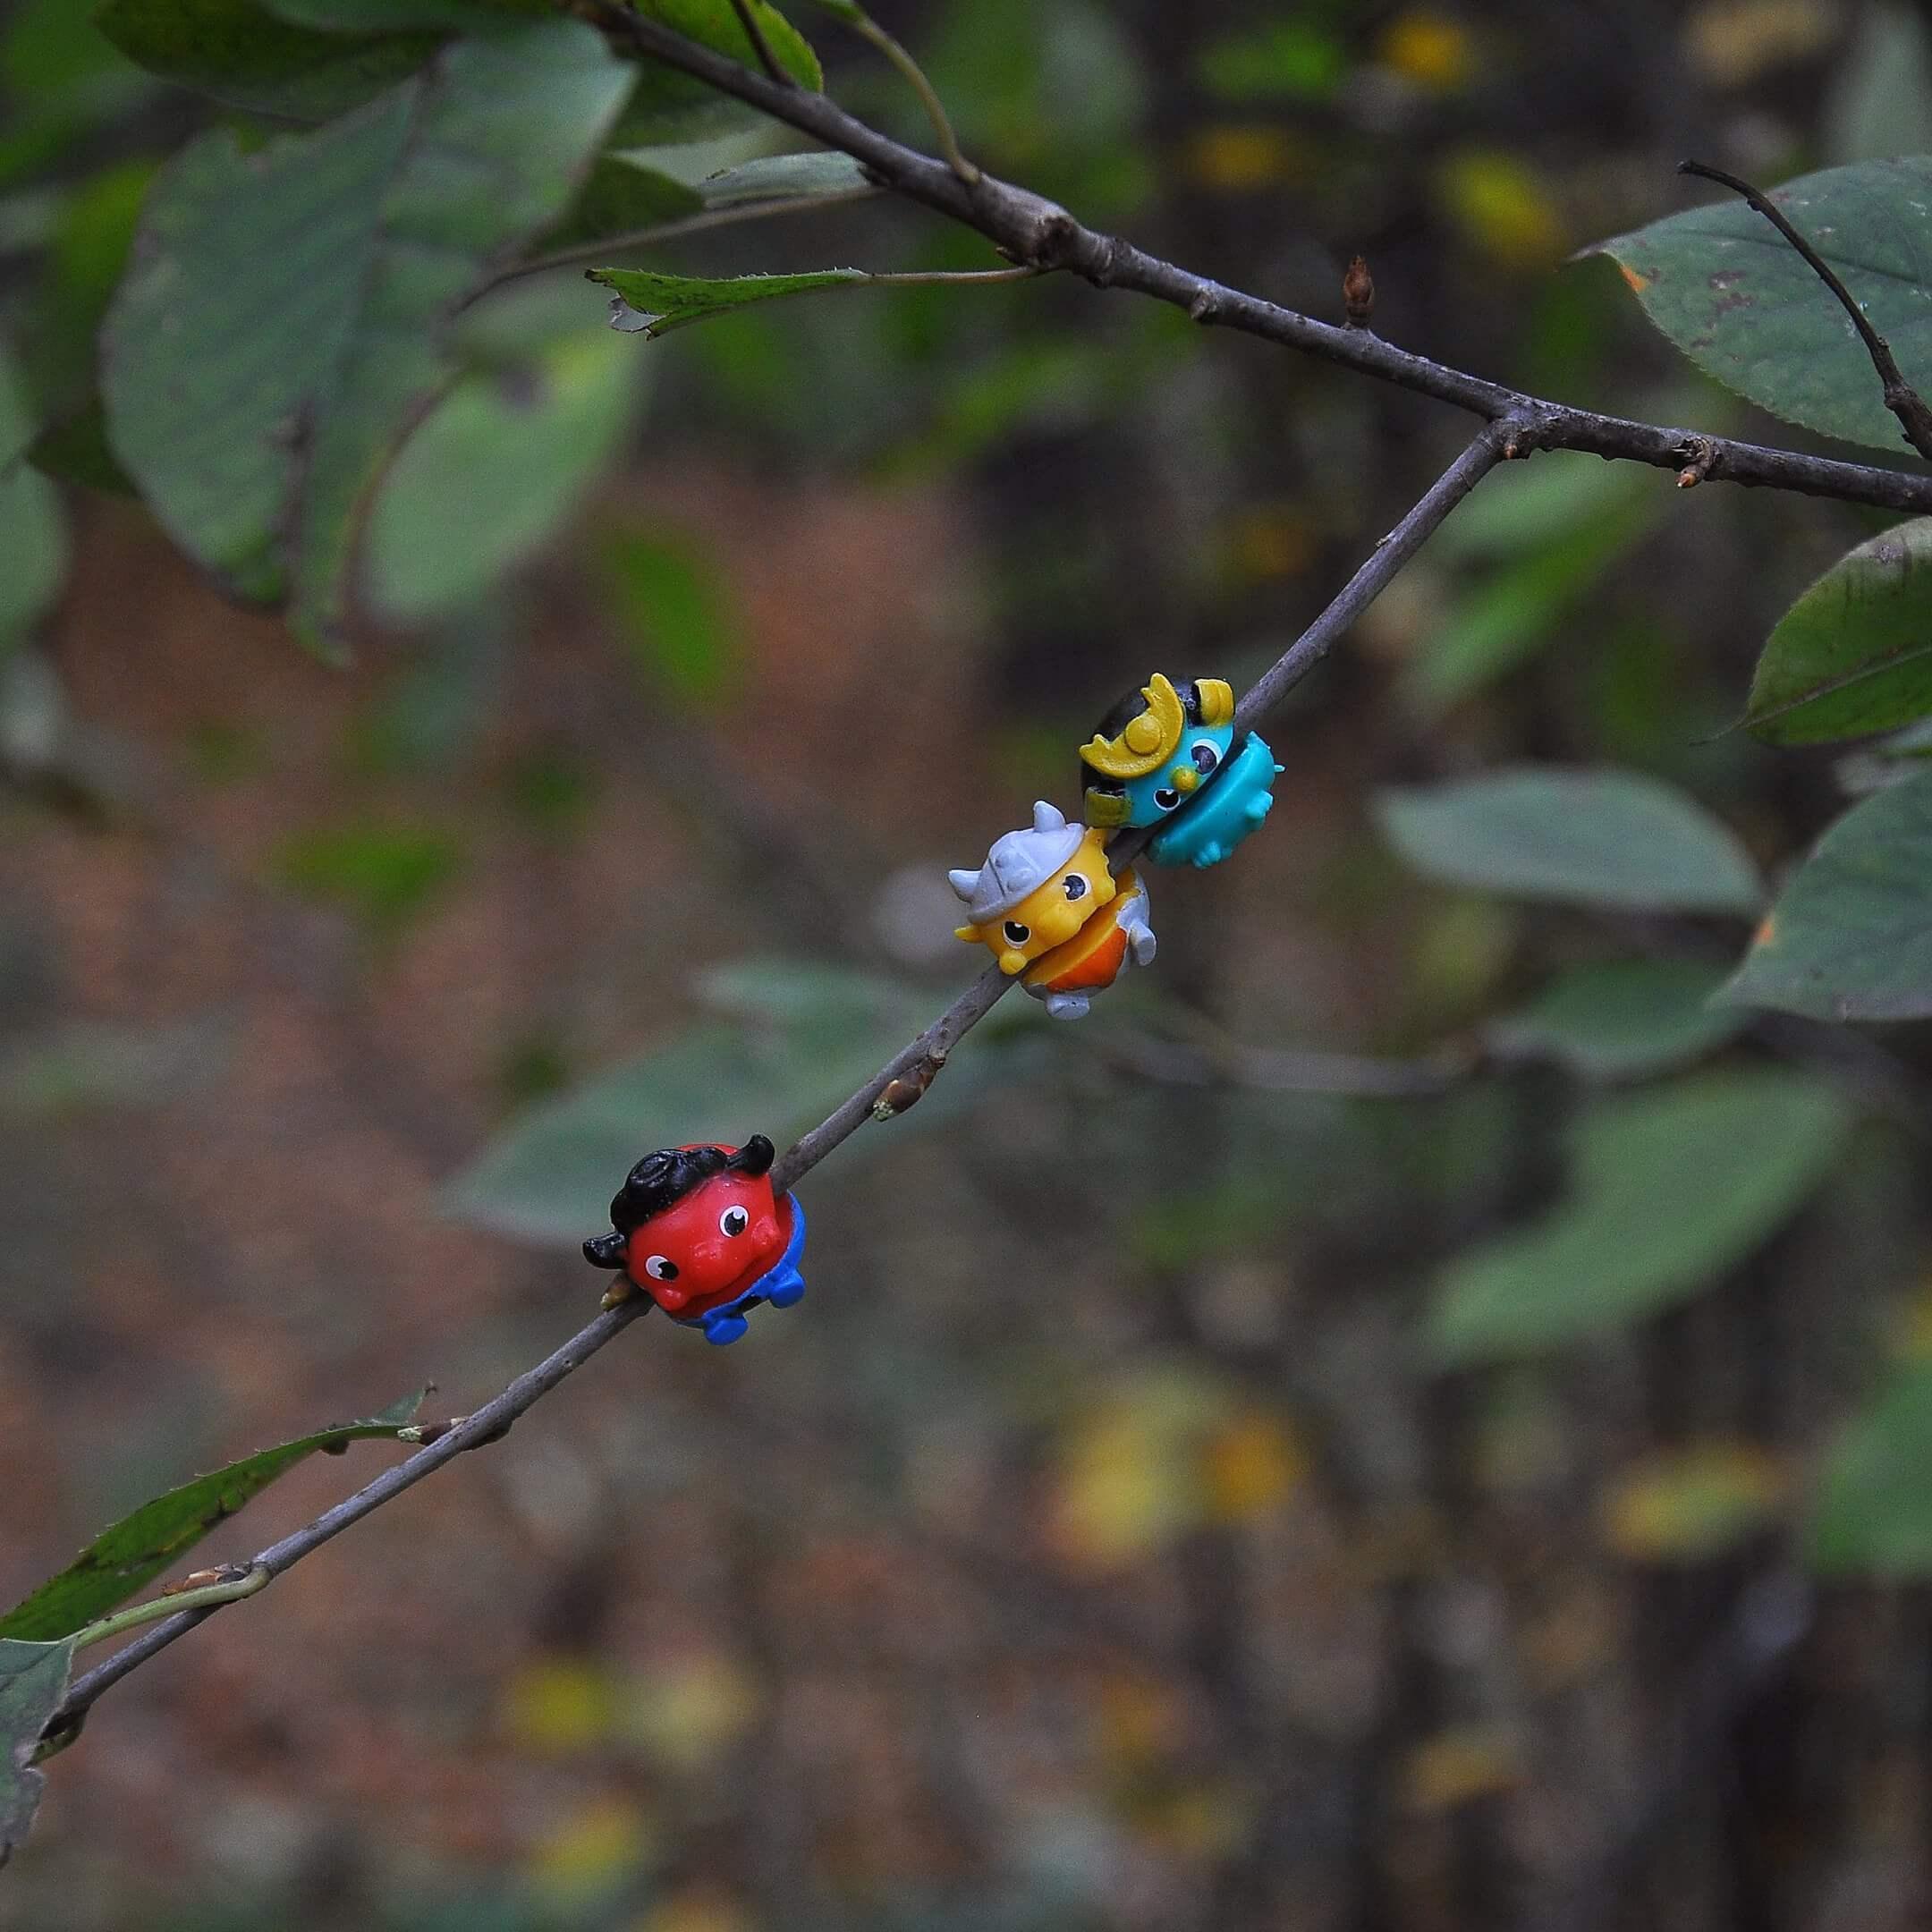 Bbuddieez (биббадиз): зверушки шармики для коллекционирования